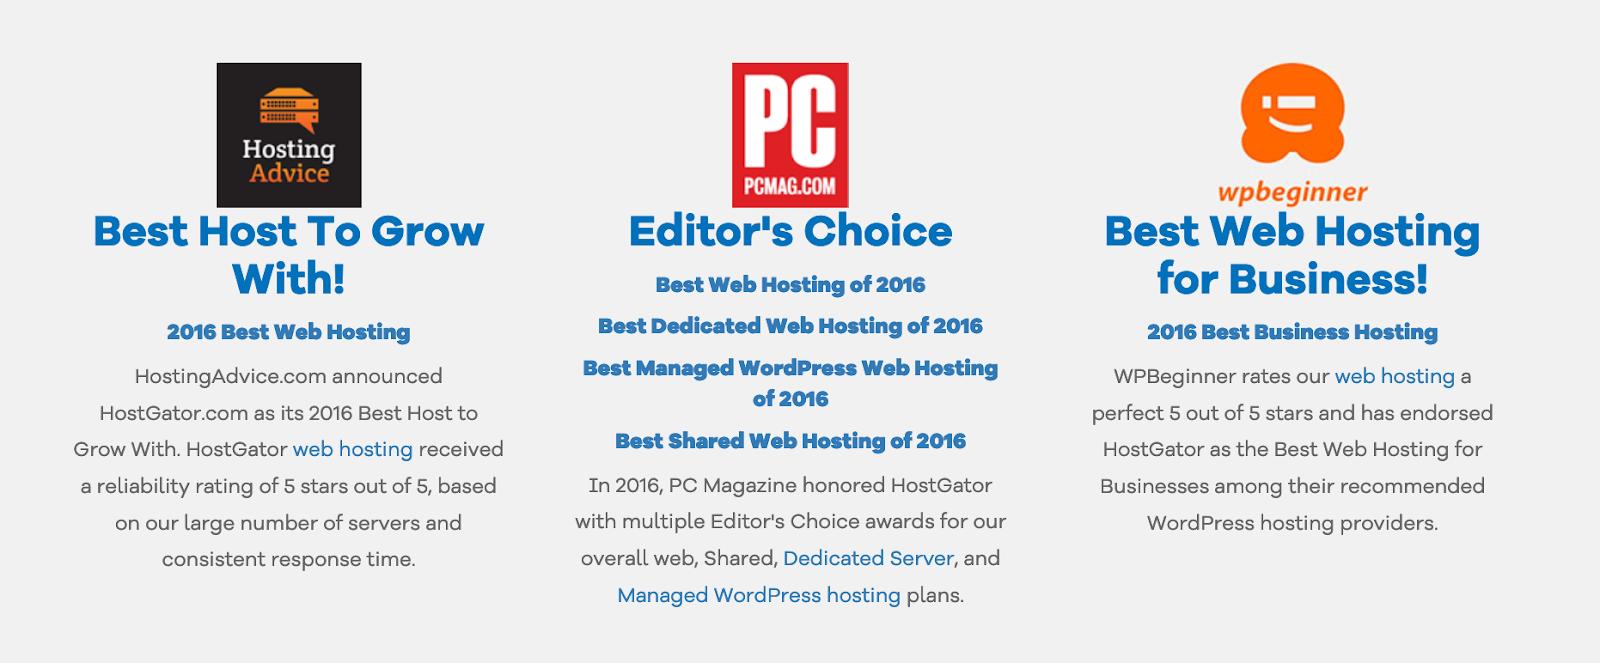 Hosting awards on HostGator.com